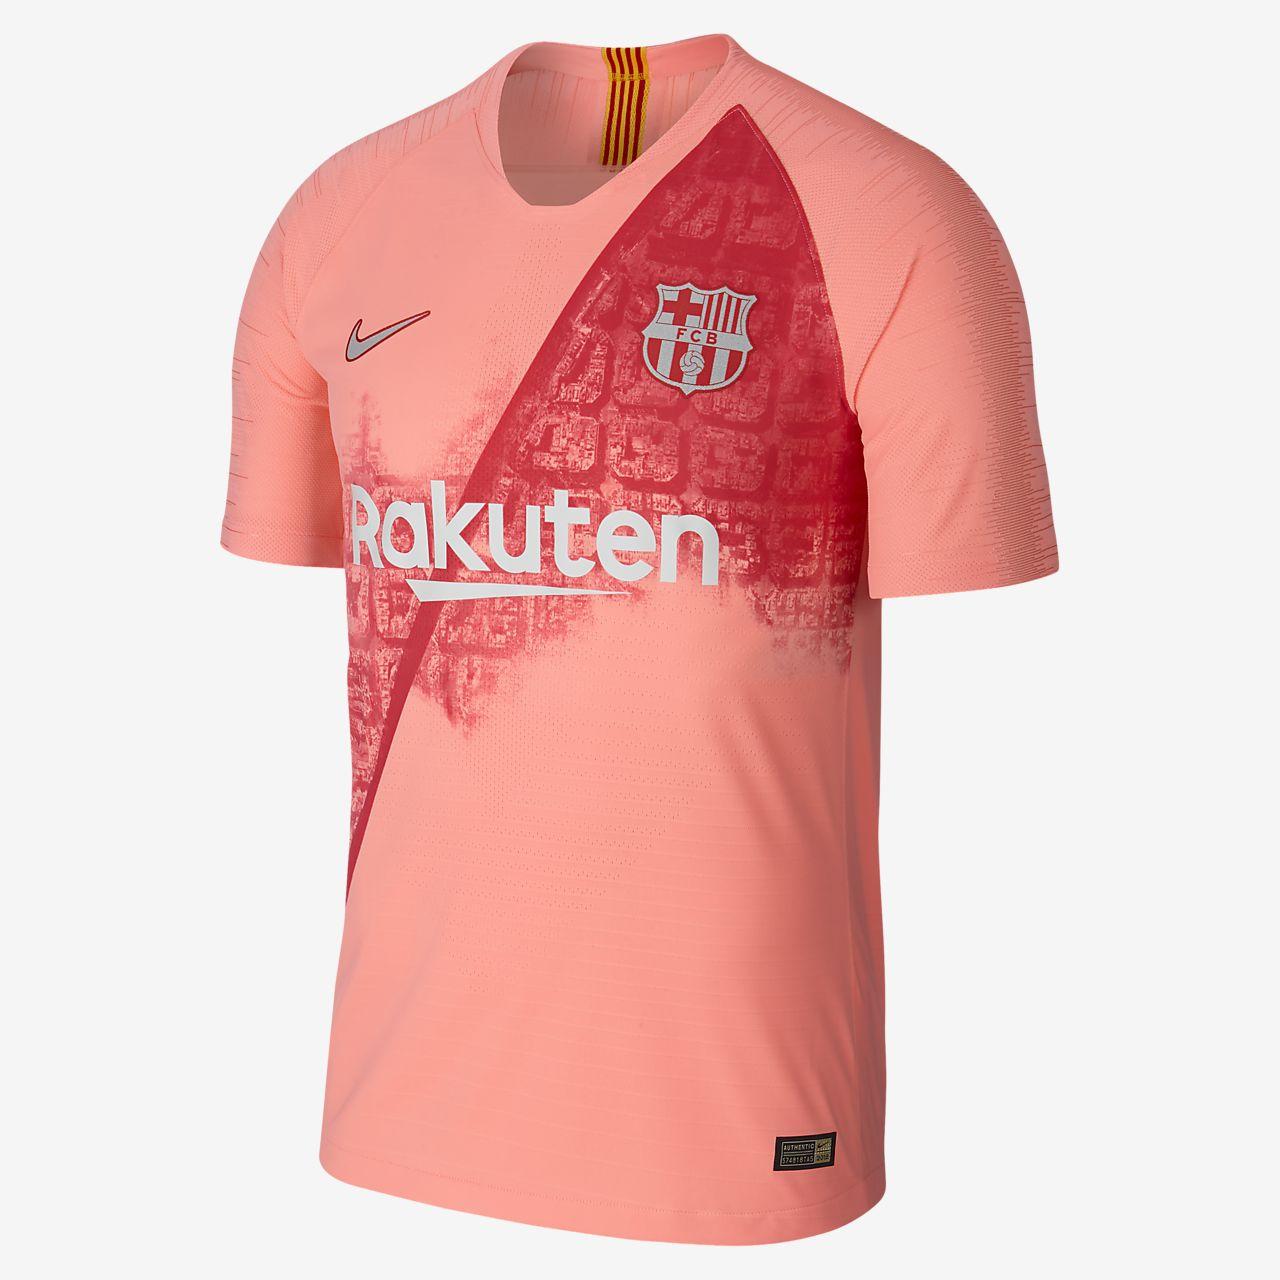 Camiseta de fútbol para hombre alternativa Vapor Match del FC Barcelona para la temporada 2018/19